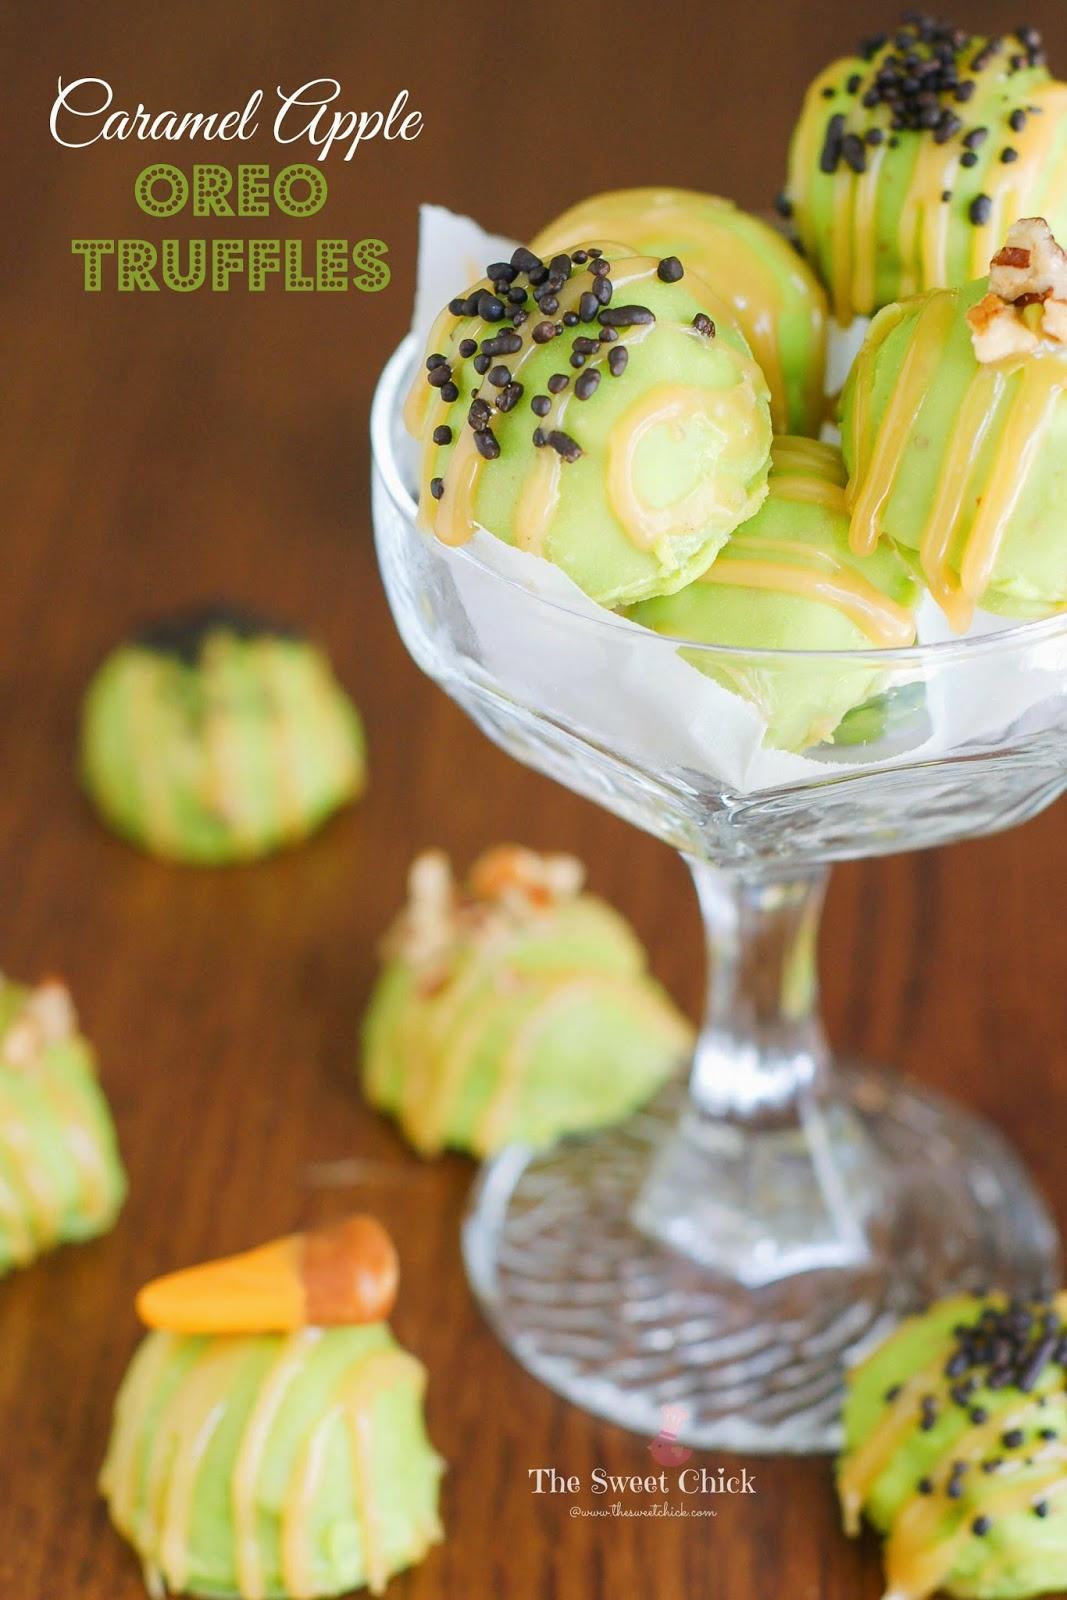 Caramel Apple Oreo Truffles by The Sweet Chick